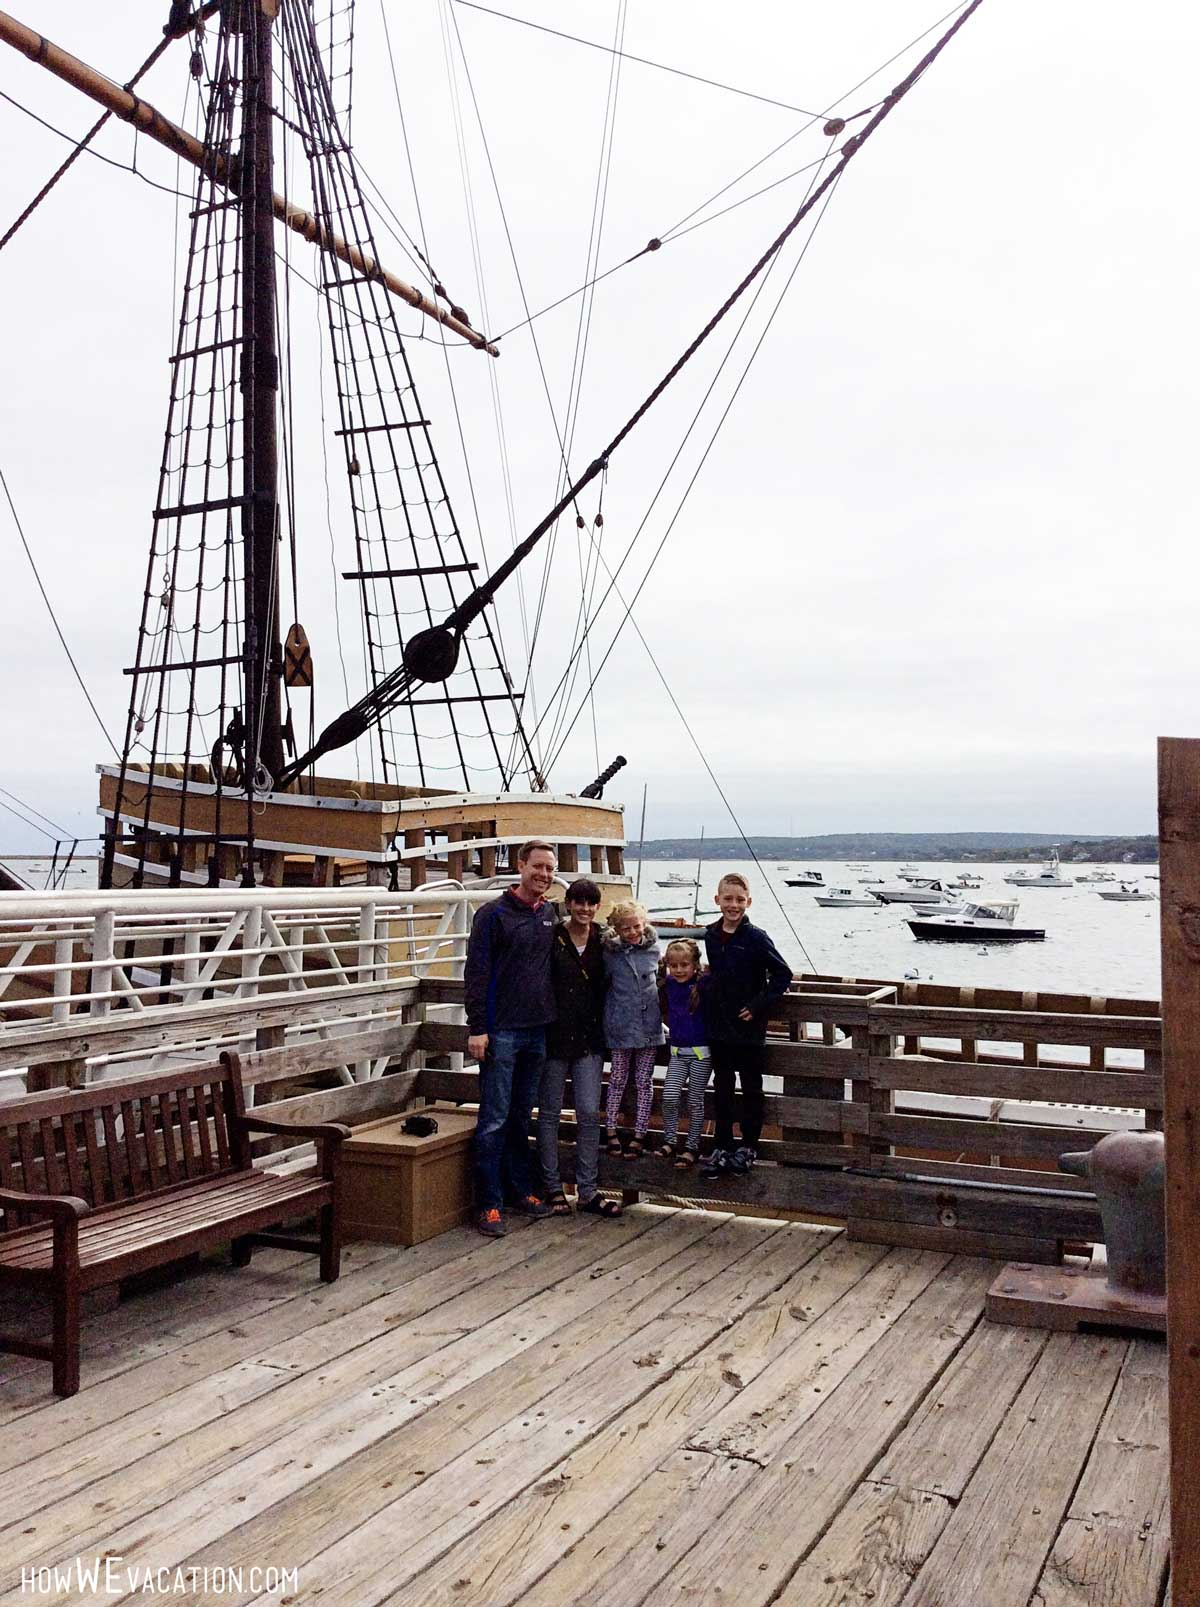 Plymouth Mayflower